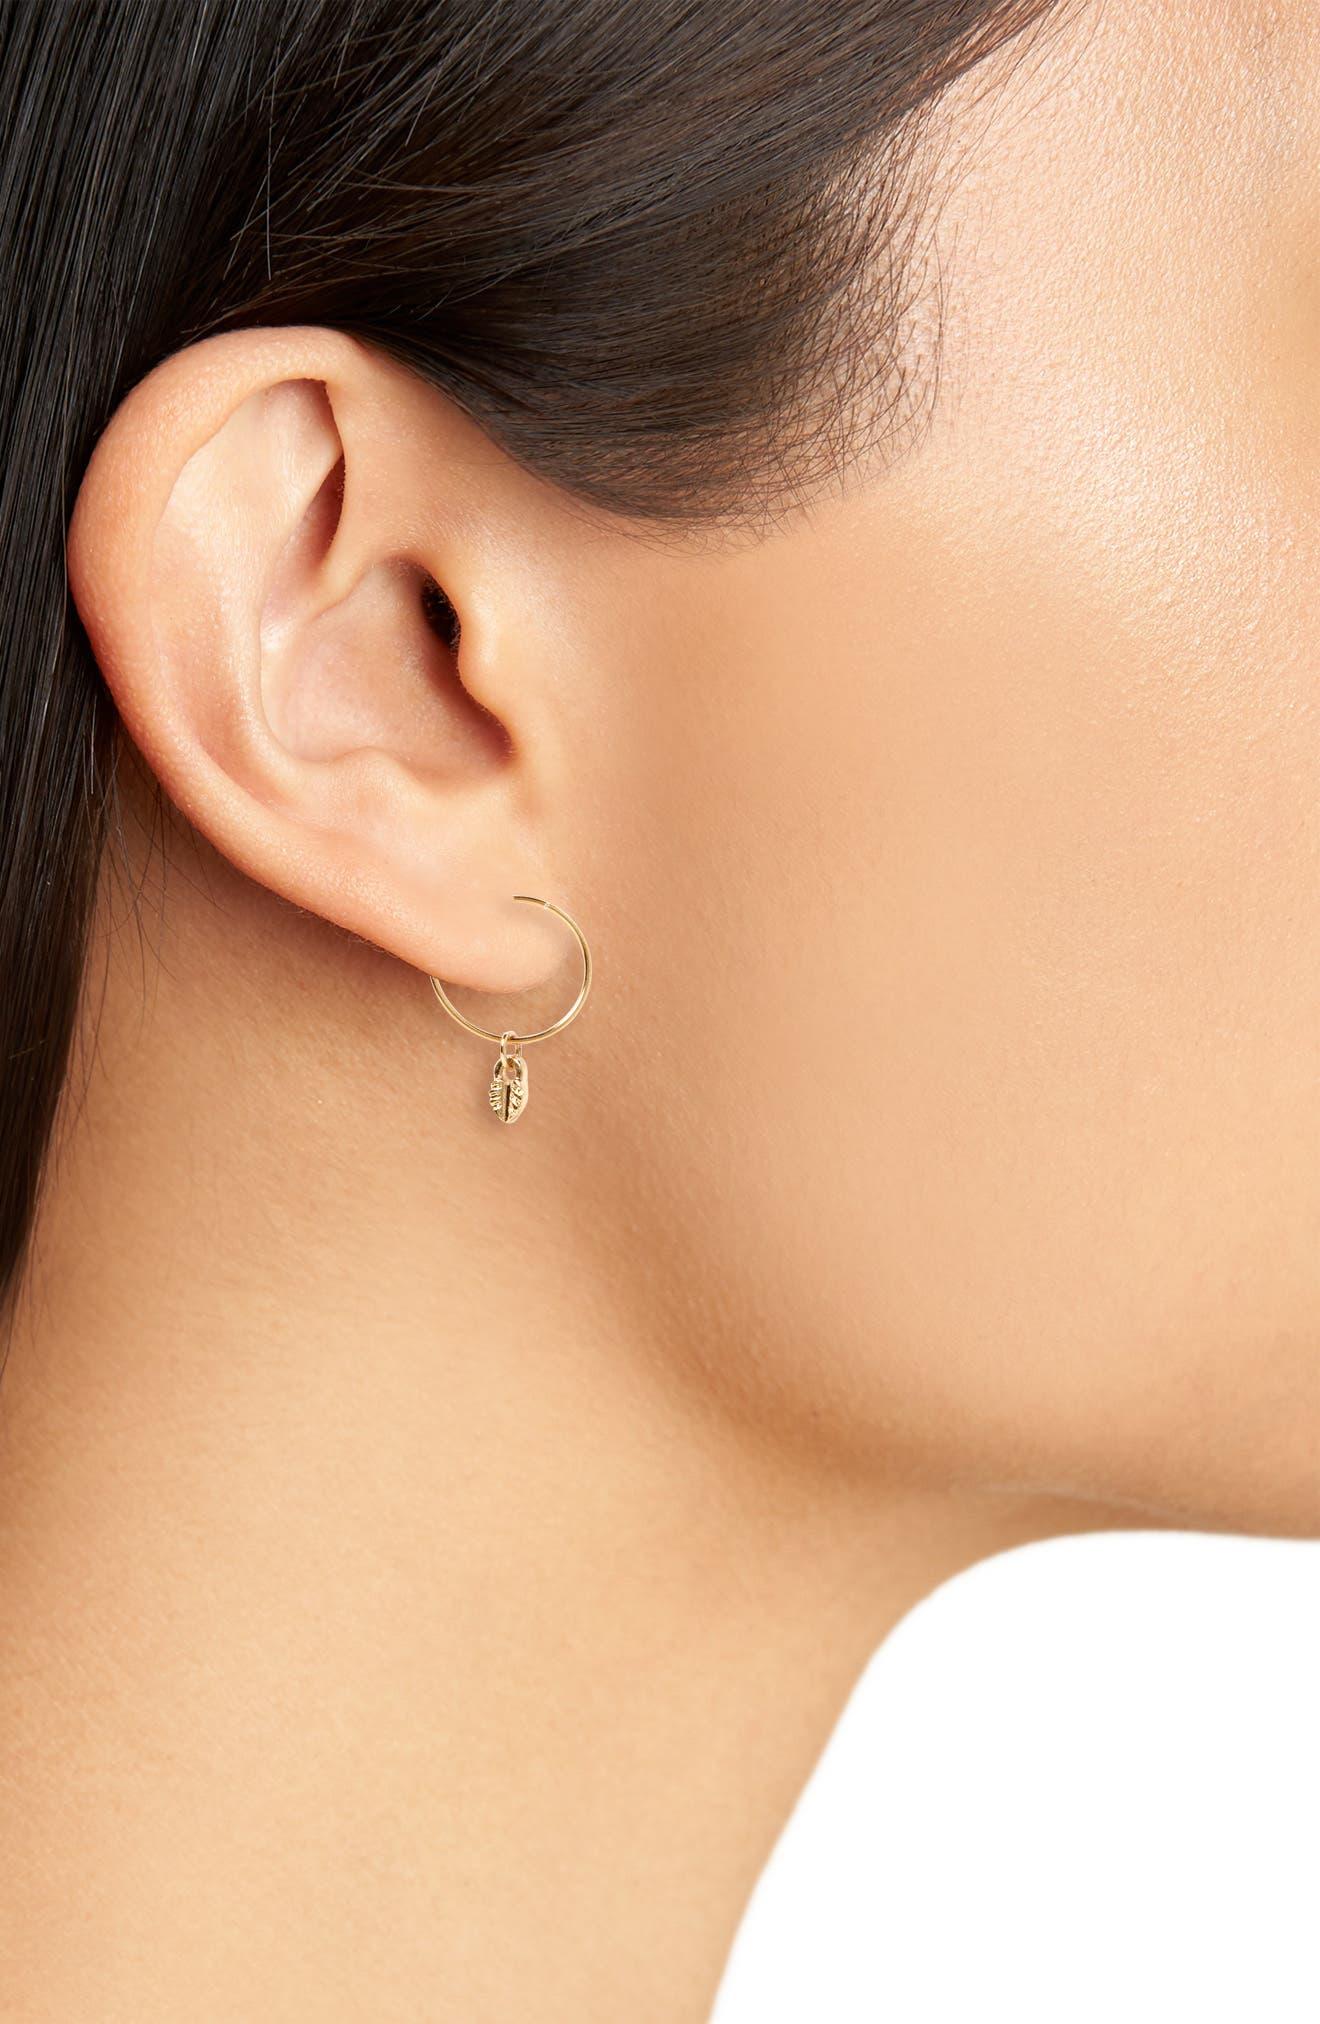 Set of 3 Charm Hoop Earrings,                             Alternate thumbnail 2, color,                             Bright Multi